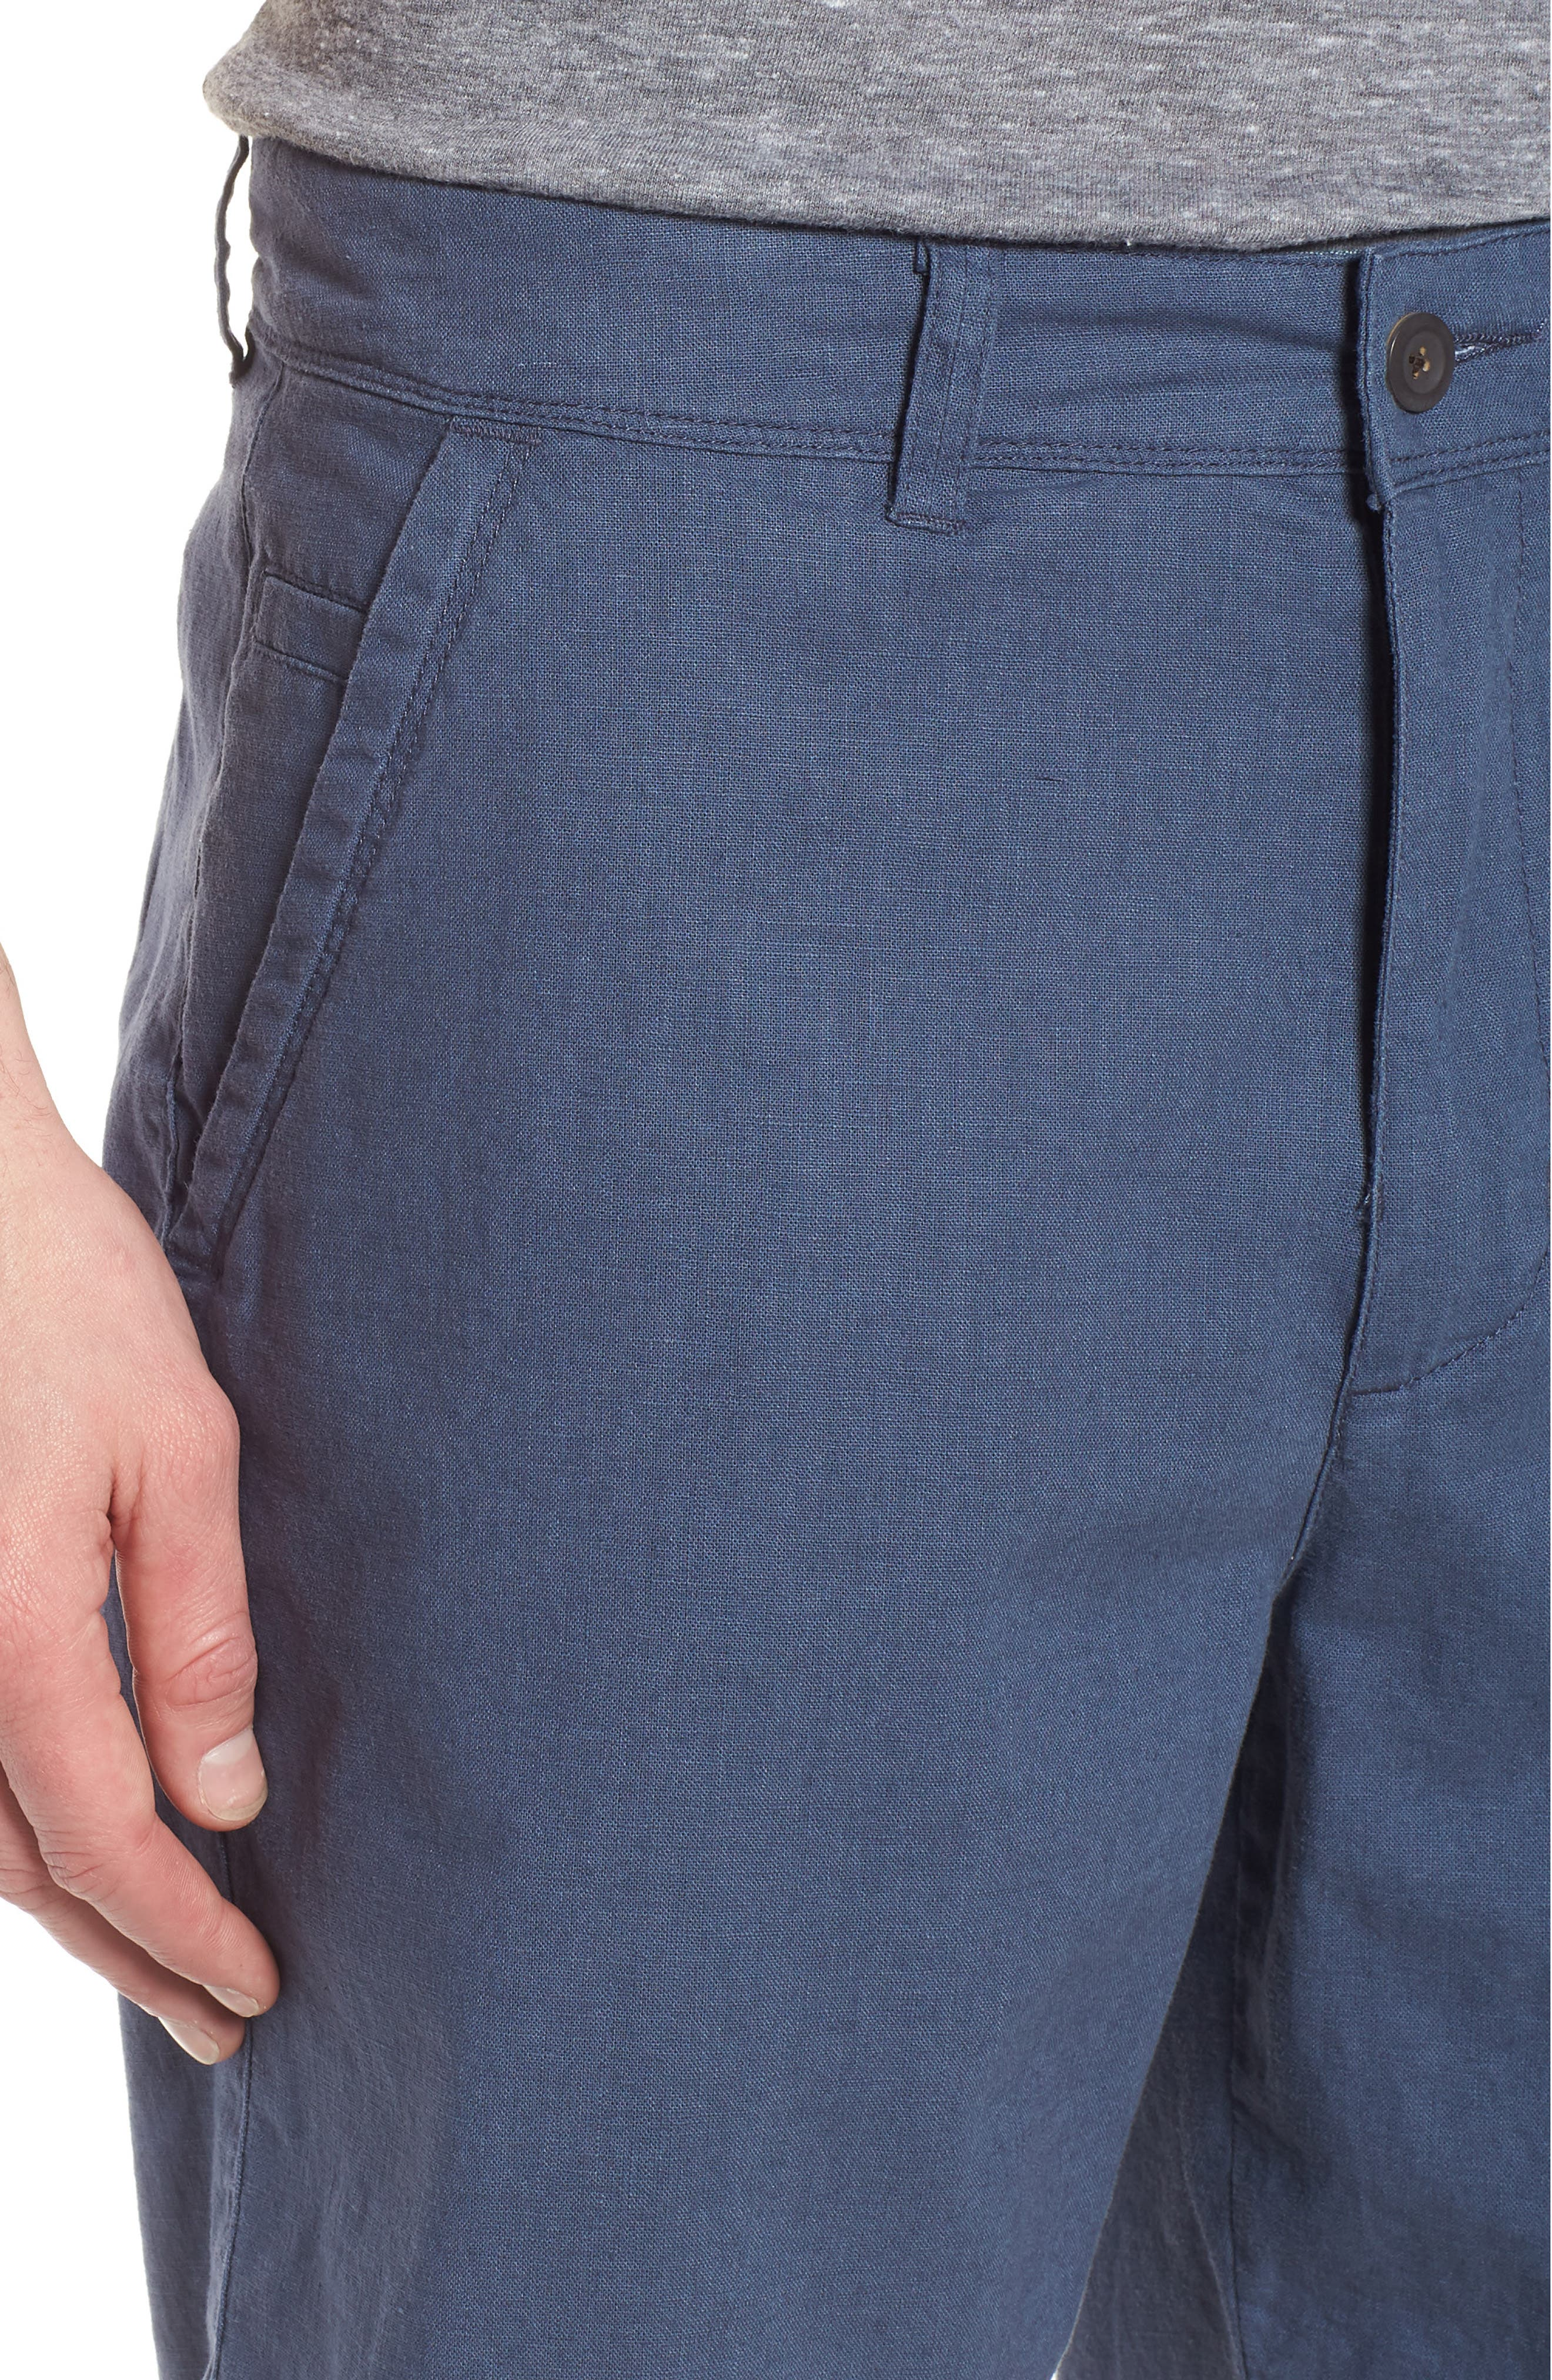 Islander Linen & Cotton Shorts,                             Alternate thumbnail 4, color,                             410